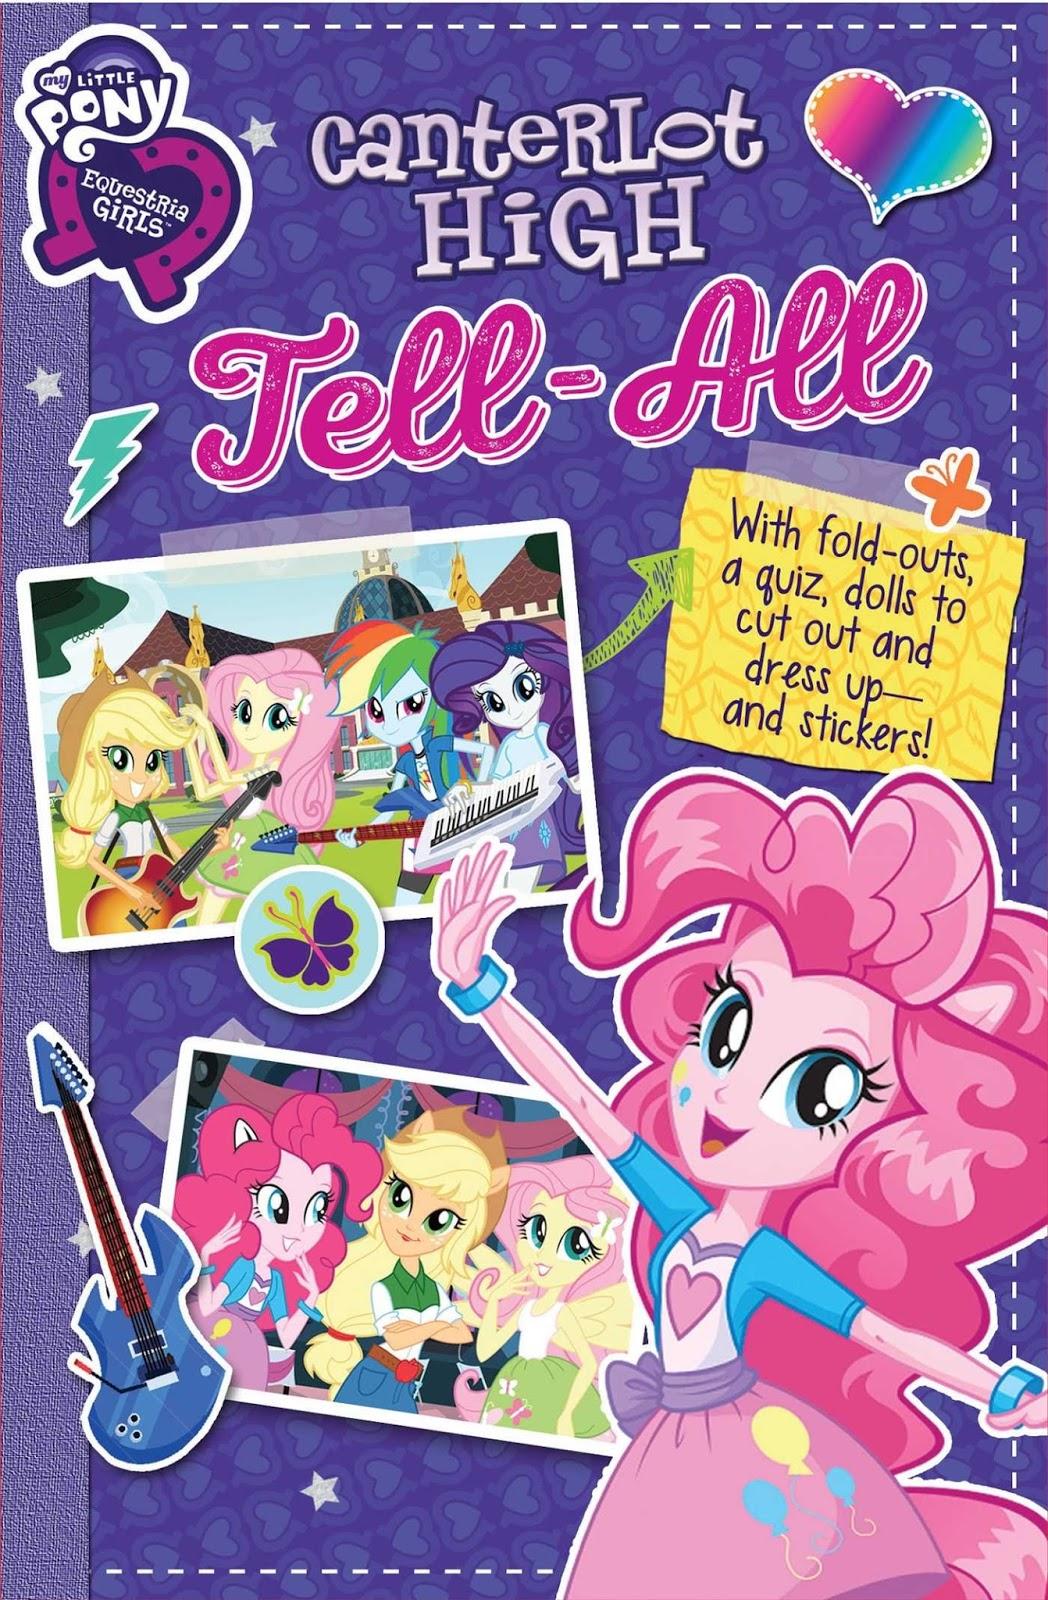 MLP Equestria Girls: Canterlot High Tell-All Book